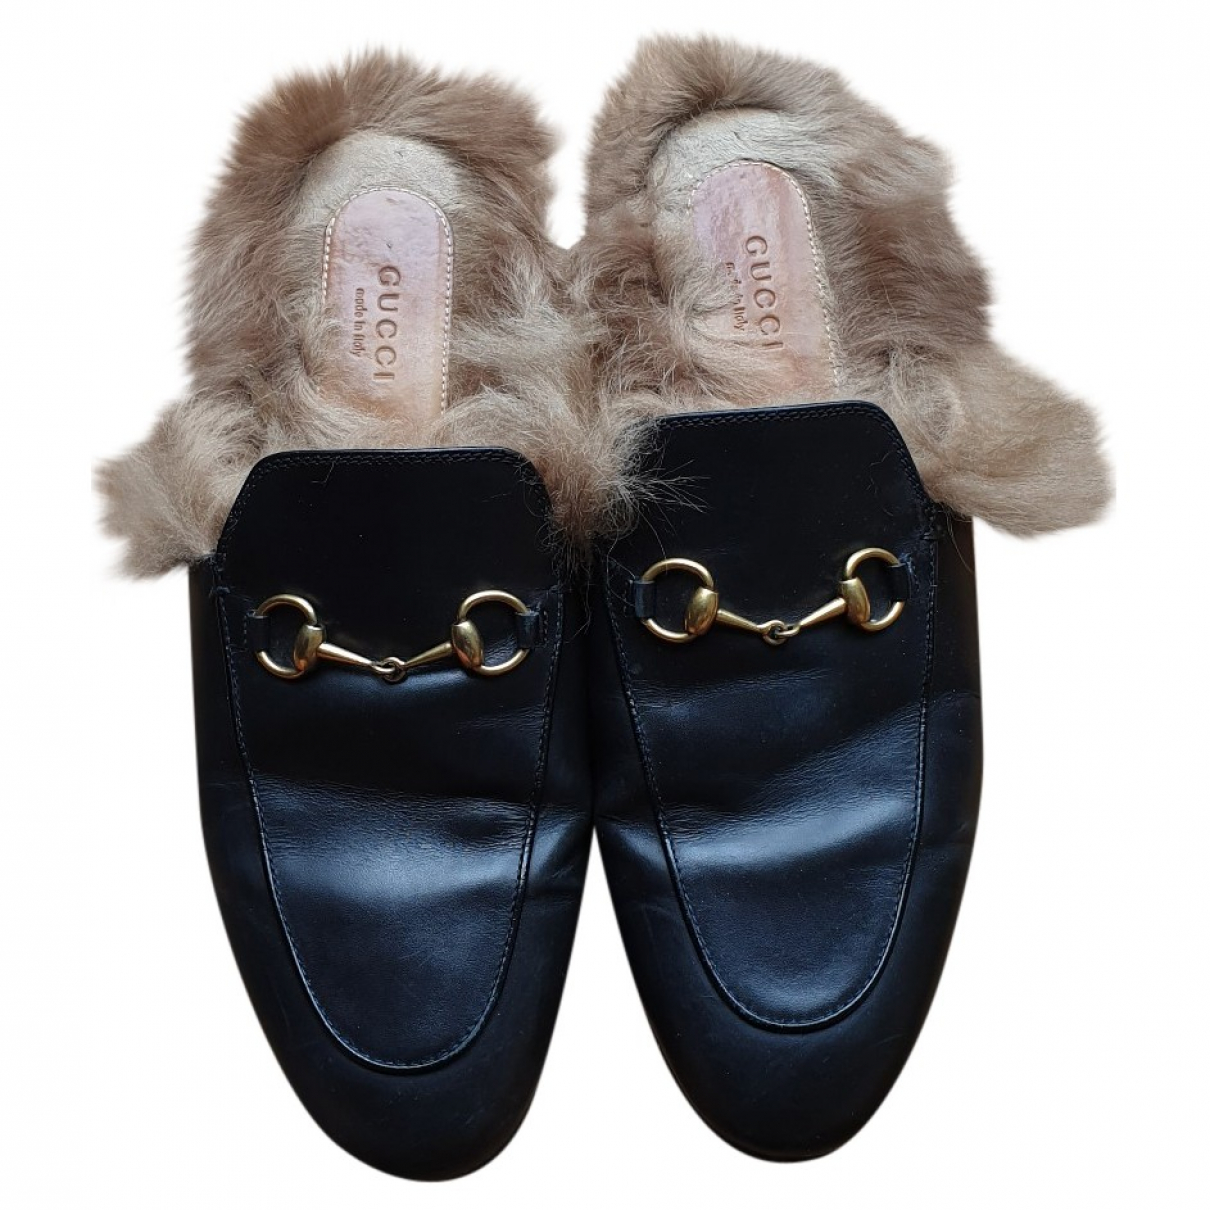 Gucci Princetown Black Leather Flats for Women 39 EU